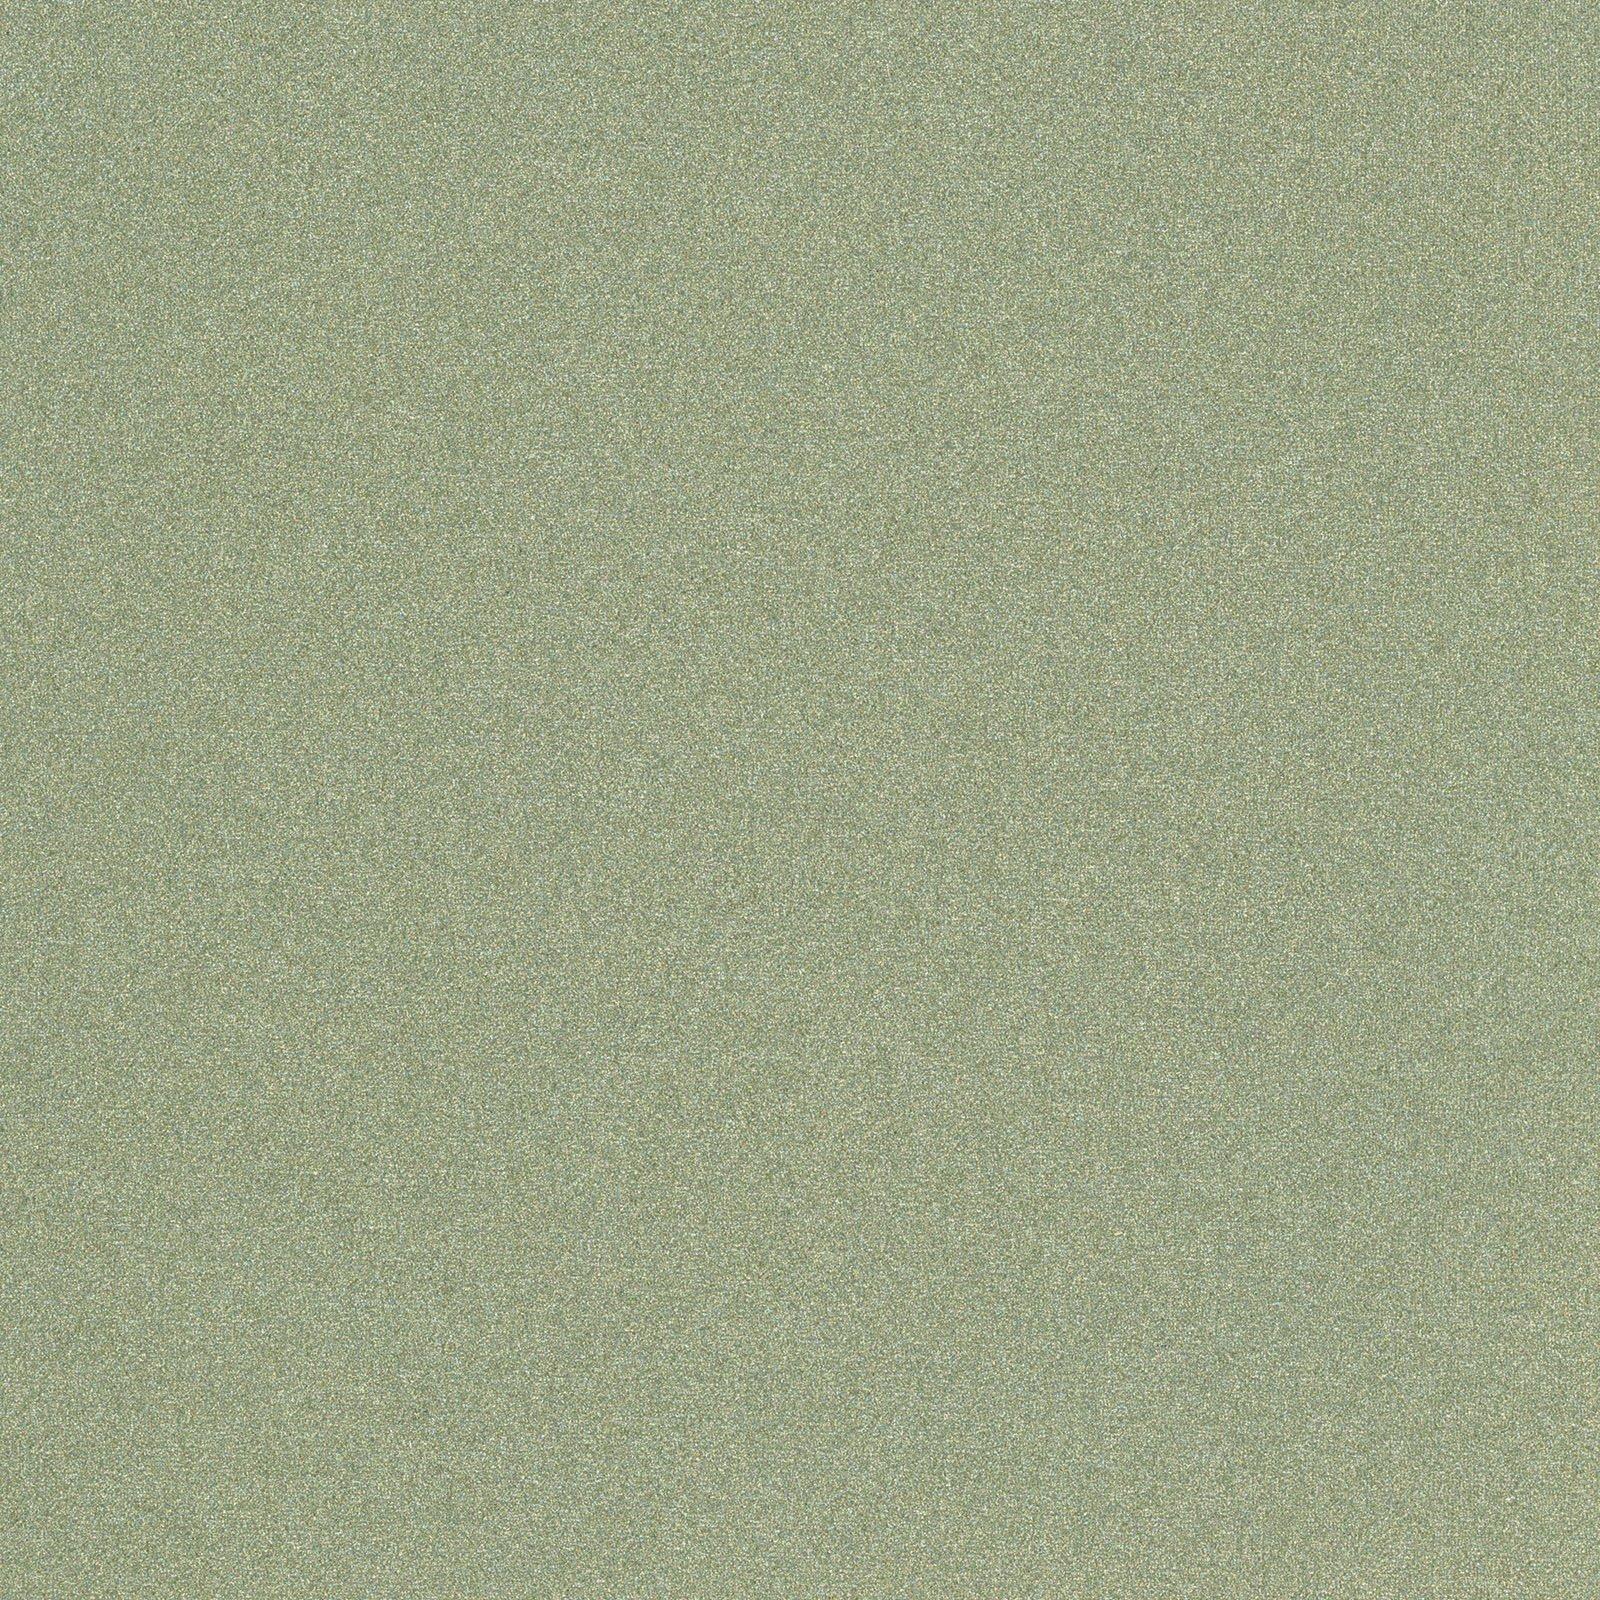 EESC-M1000 G2 - STARLIGHT METALLICS BY MAYWOOD STUDIO JADE - AVAILABLE TO ORDER